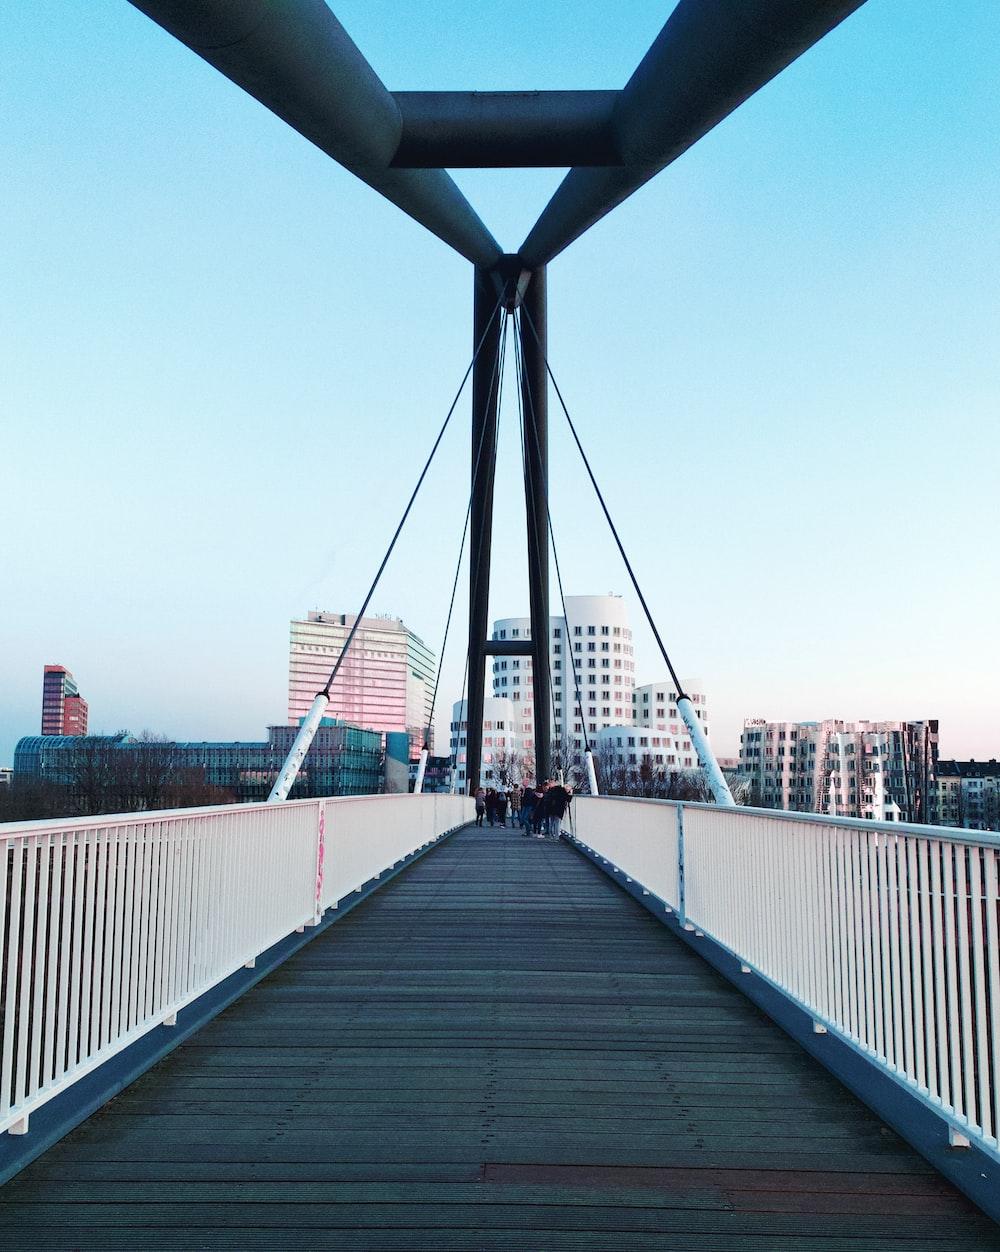 bridge near building during daytime photo